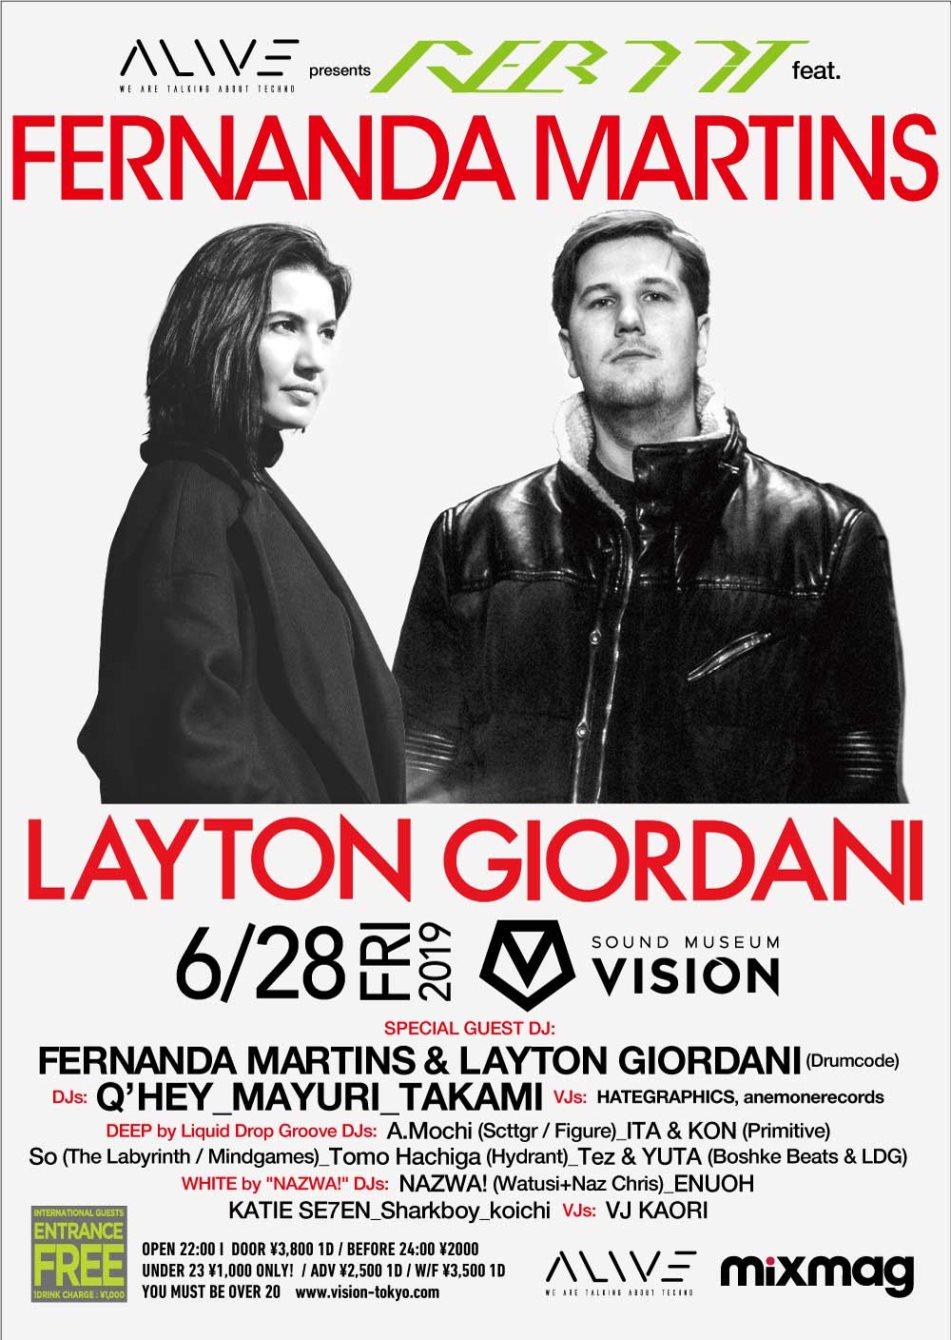 Alive presents Reboot Feat. Fernanda Martins & Layton Giordani - Flyer front